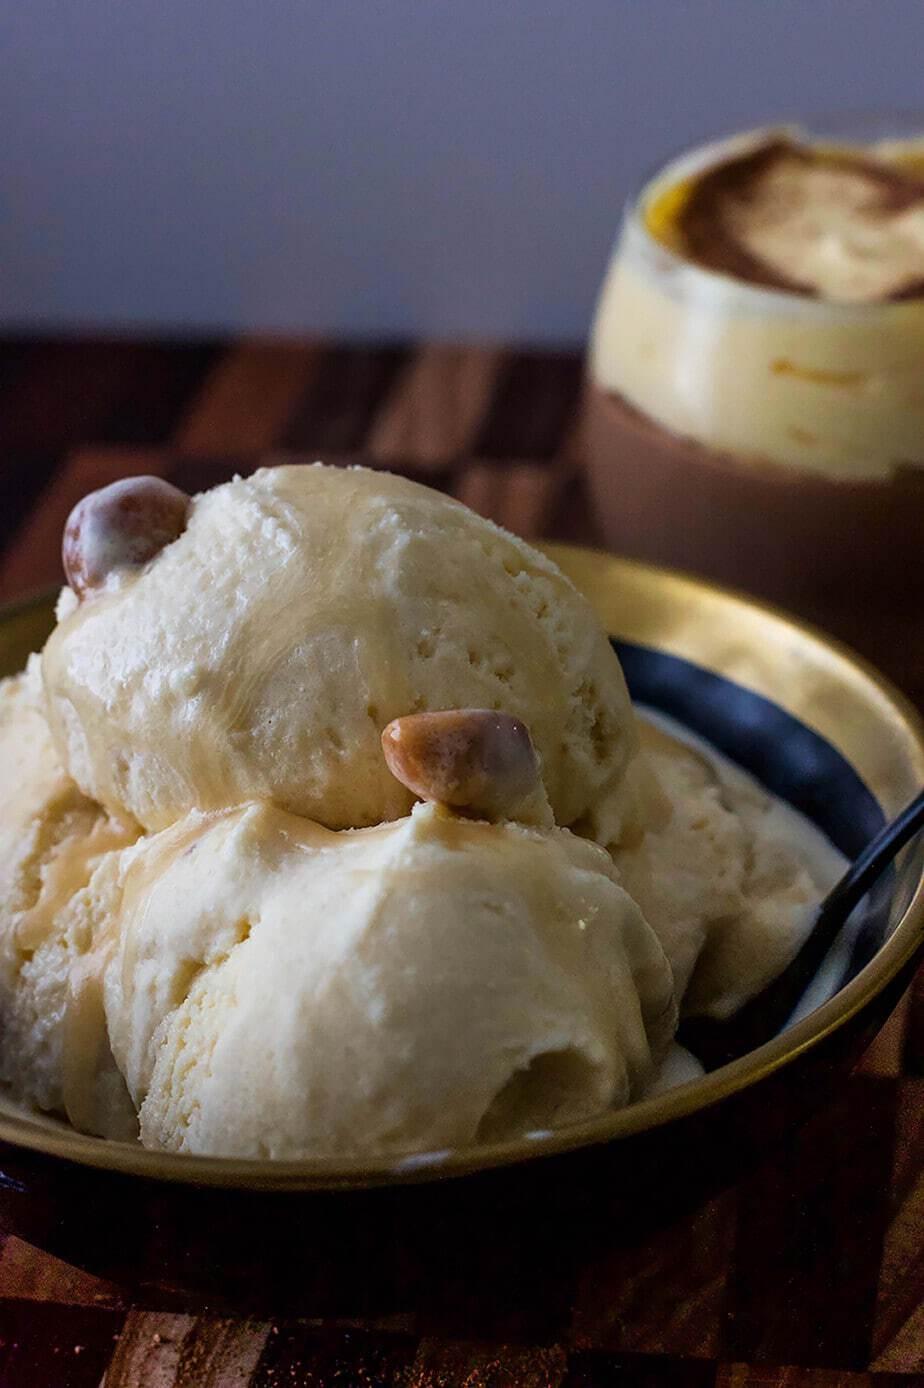 Mad Creations Lush Keto Macadamia Ice Cream